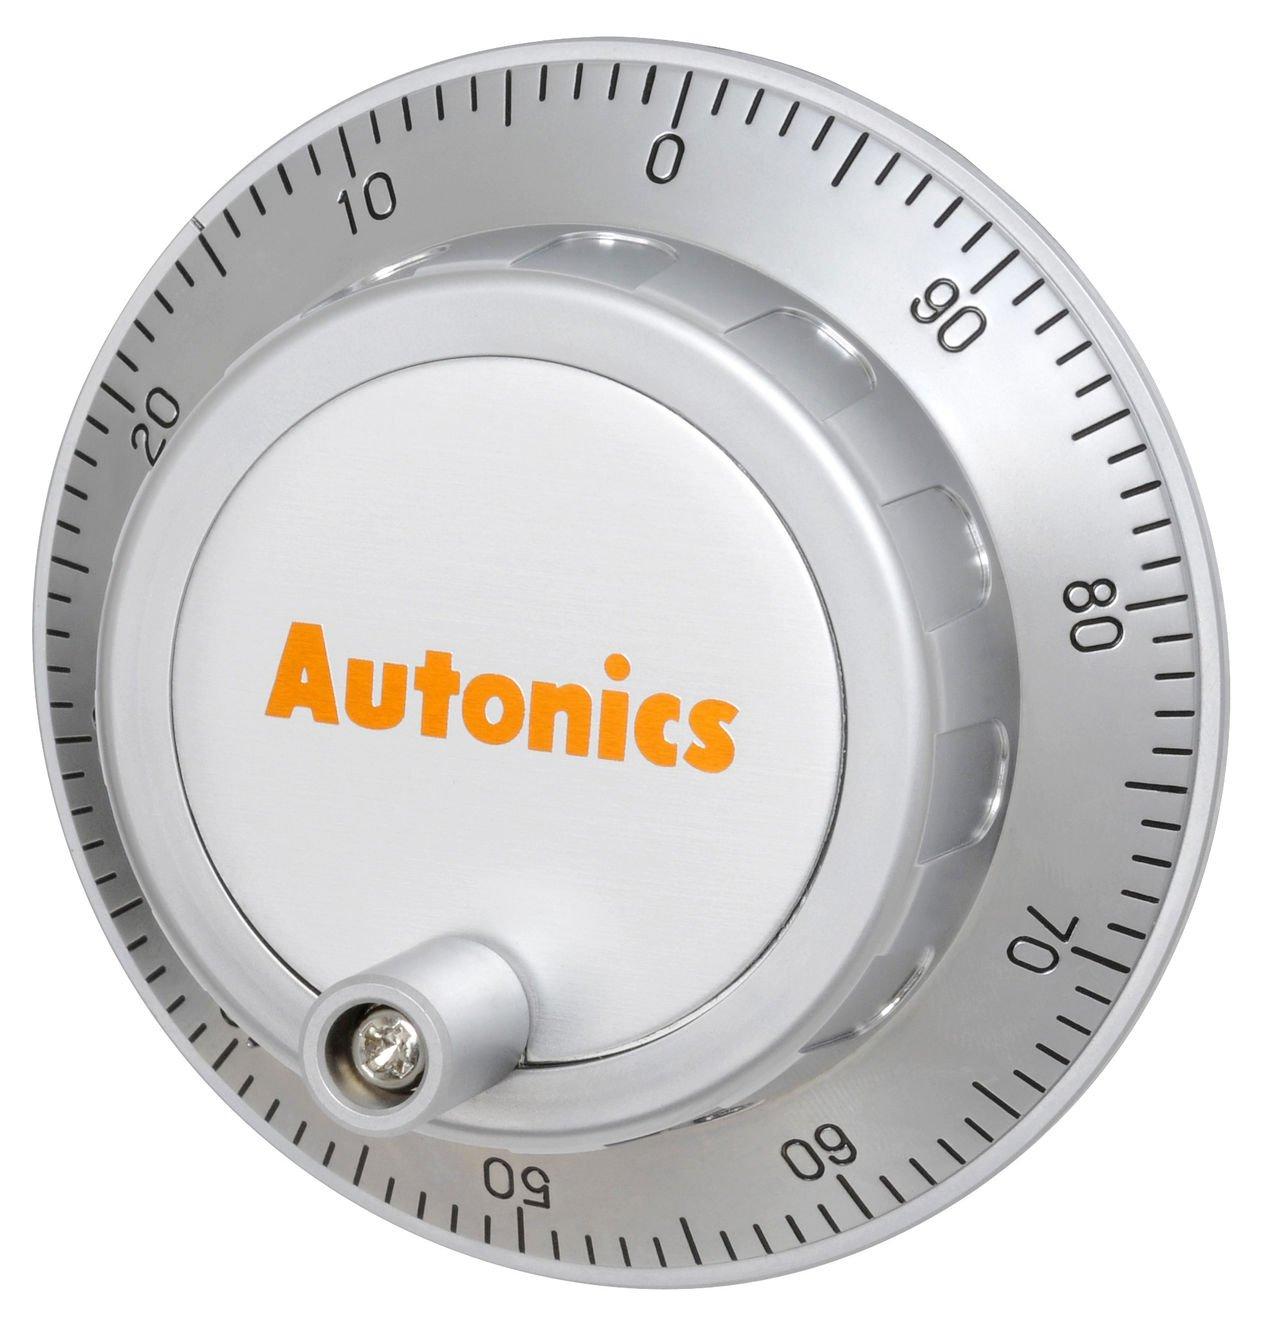 AUTONICS ENH-100-2-T-24 Encoder, Incremental, Hand Wheel, 100 PPR, 'L' Clickstopper, Totem pole output, 12-24 VDC